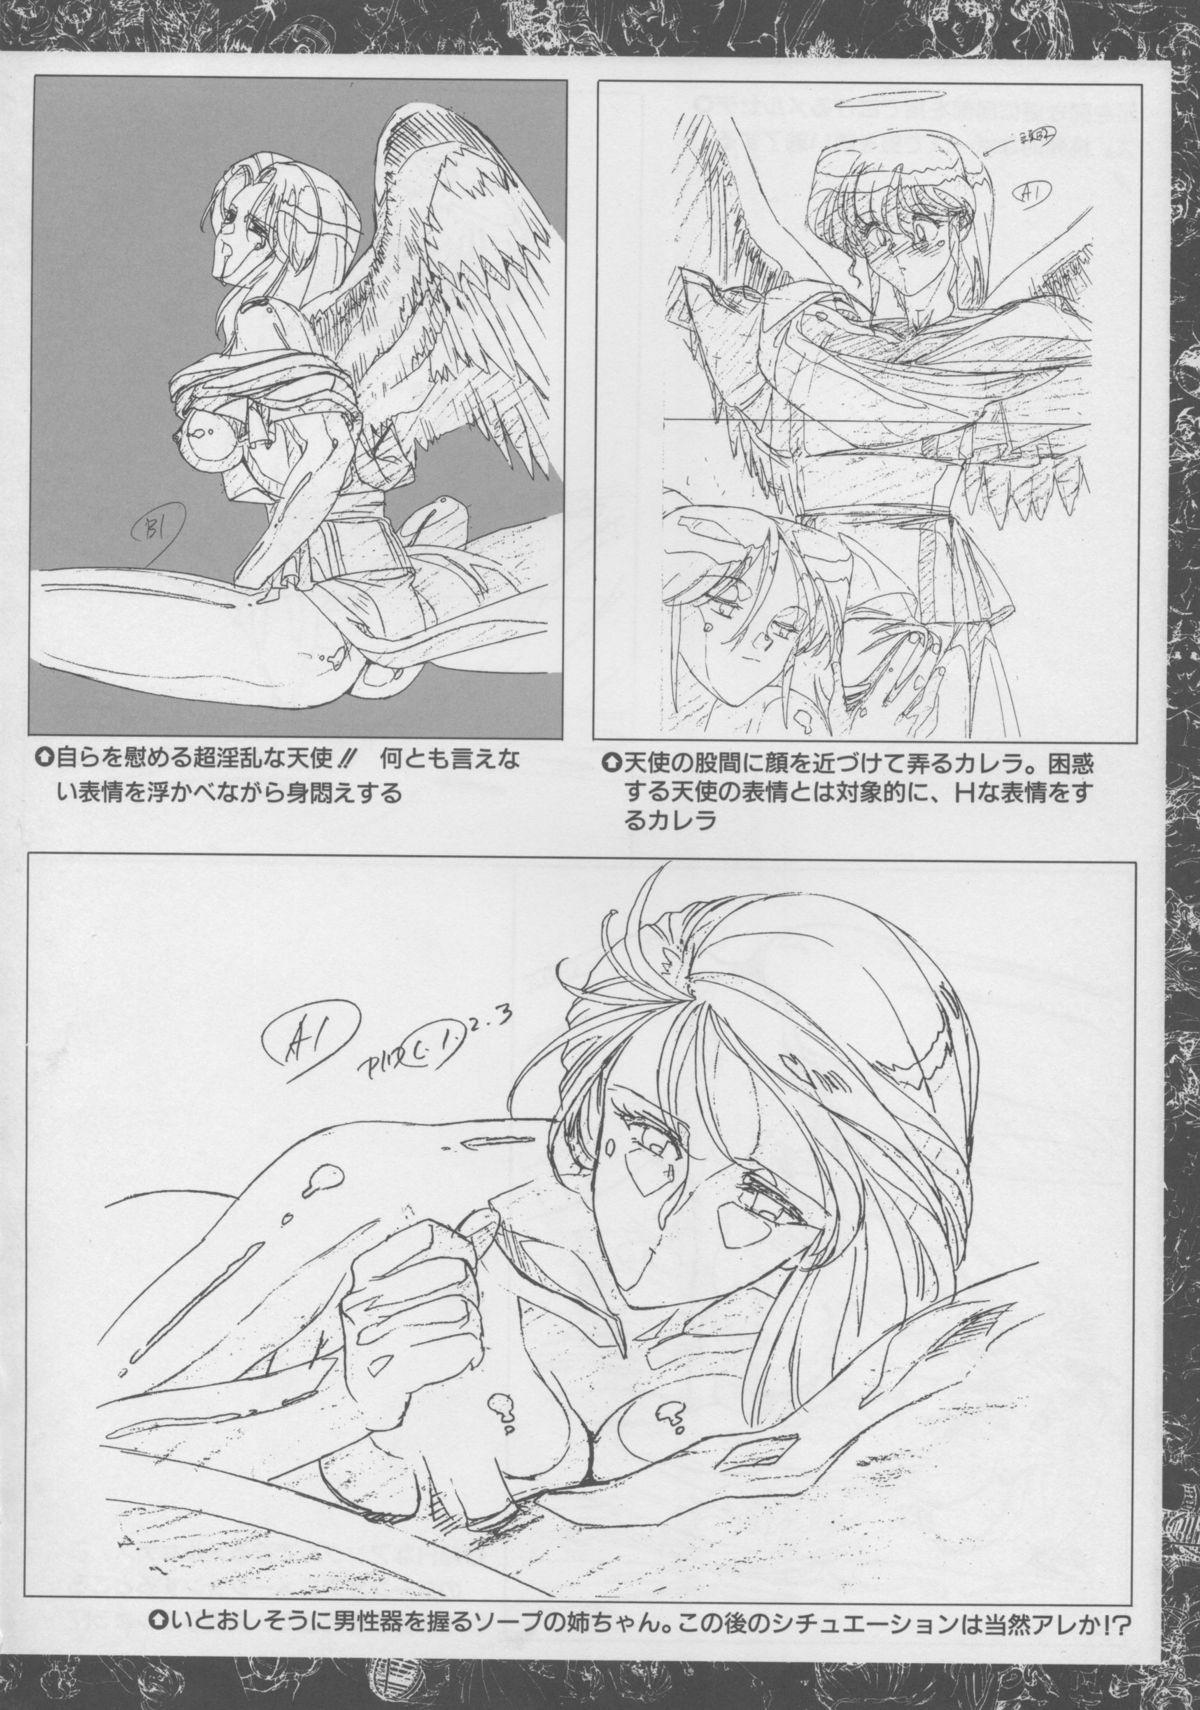 VIPER Series Official Artbook 76